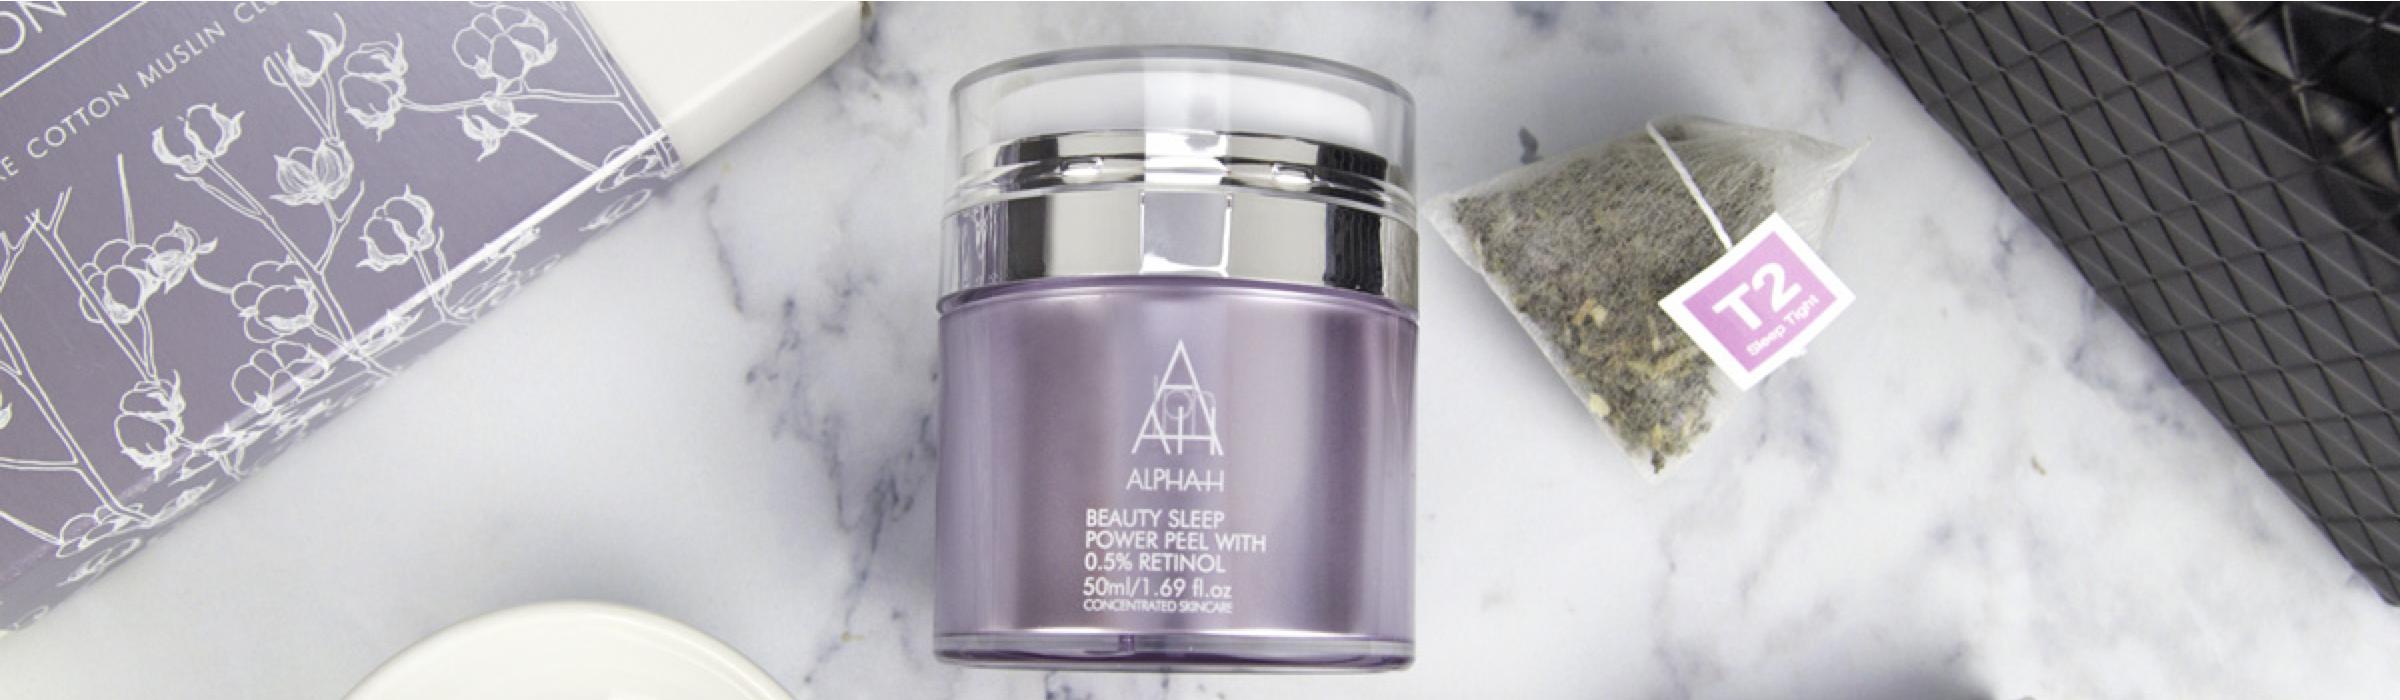 Alpha-H Beauty Sleep Power Peel Banner 2